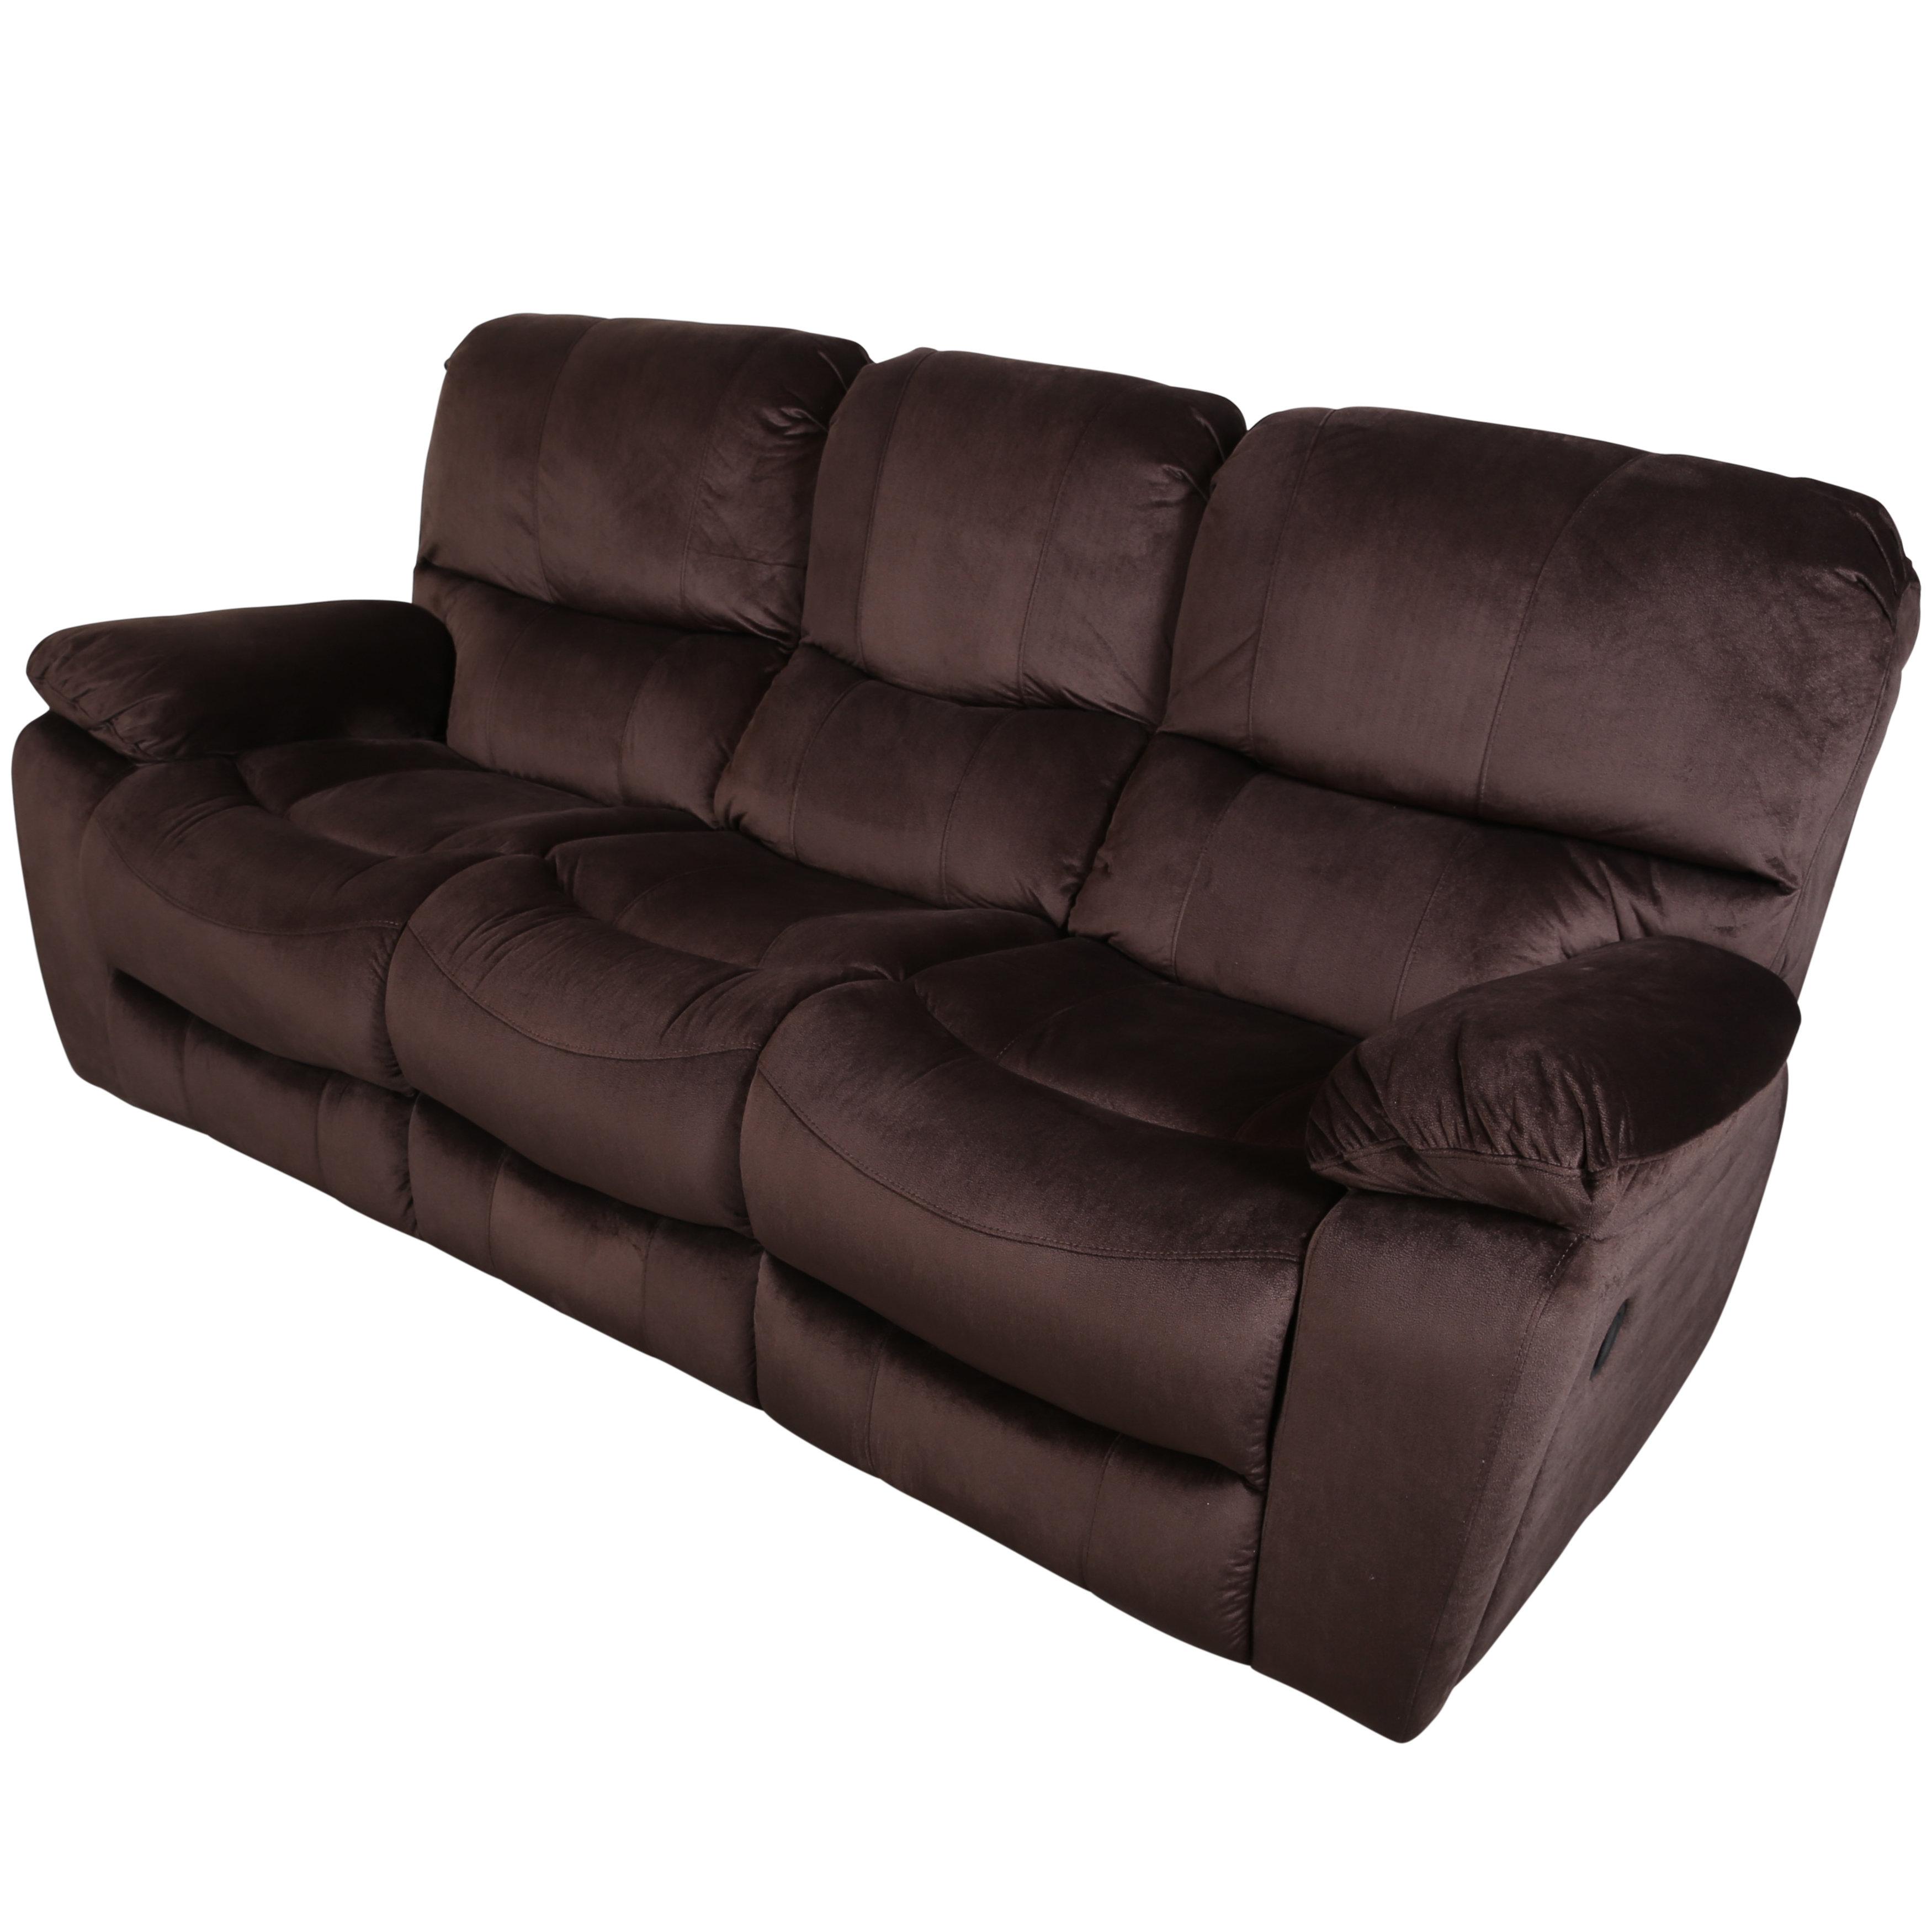 Three Posts Carraton 3 Seats Reclining Sofa Wayfair